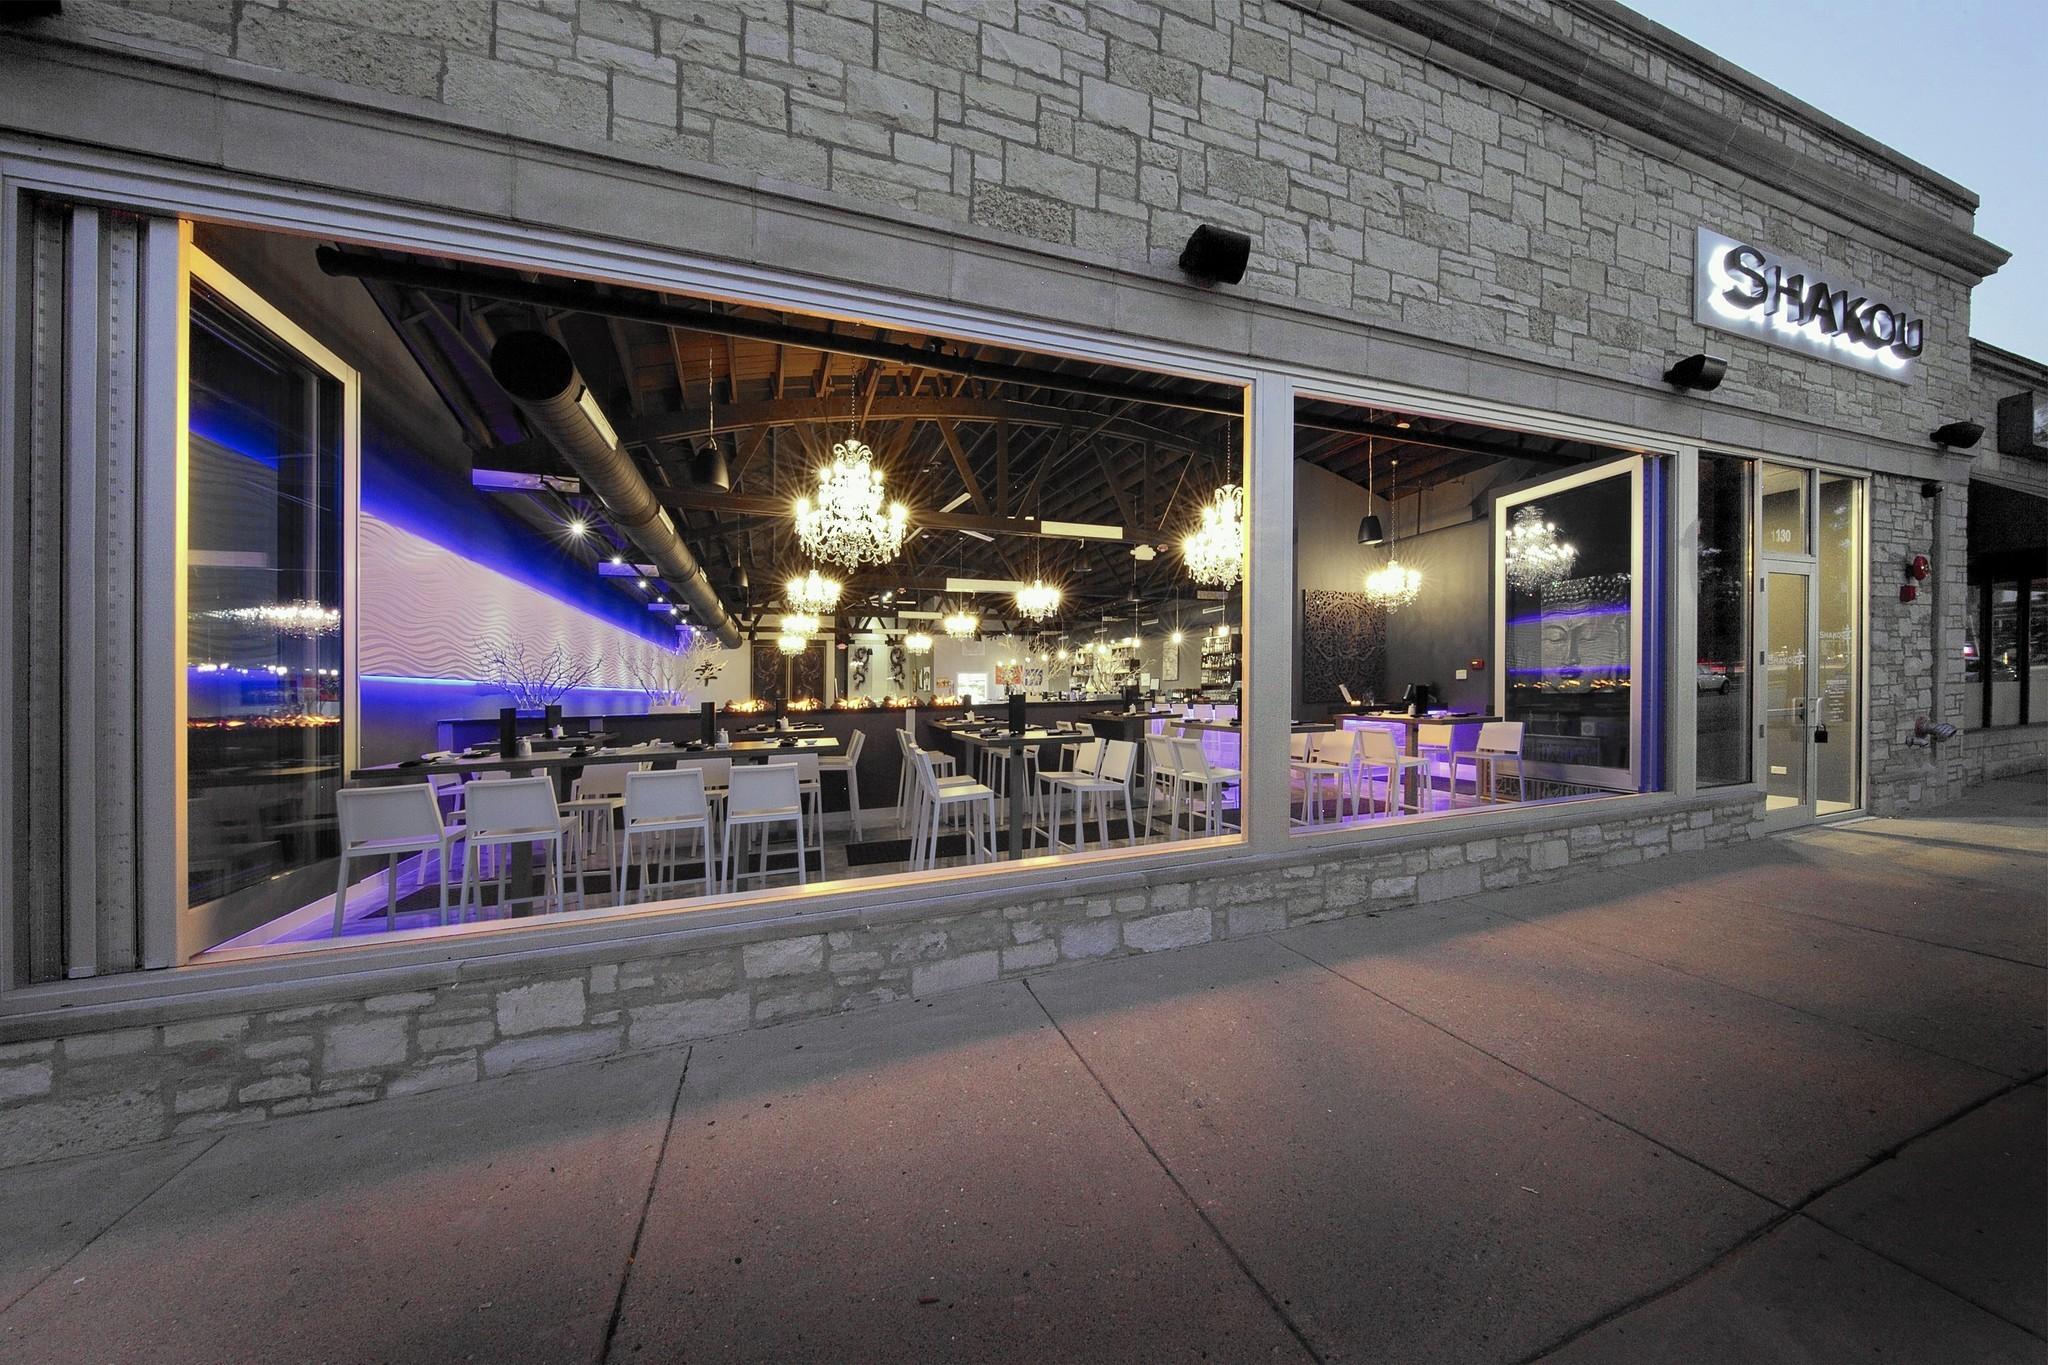 City Vibe Shakou Restaurant Opens In Park Ridge Herald Advocate